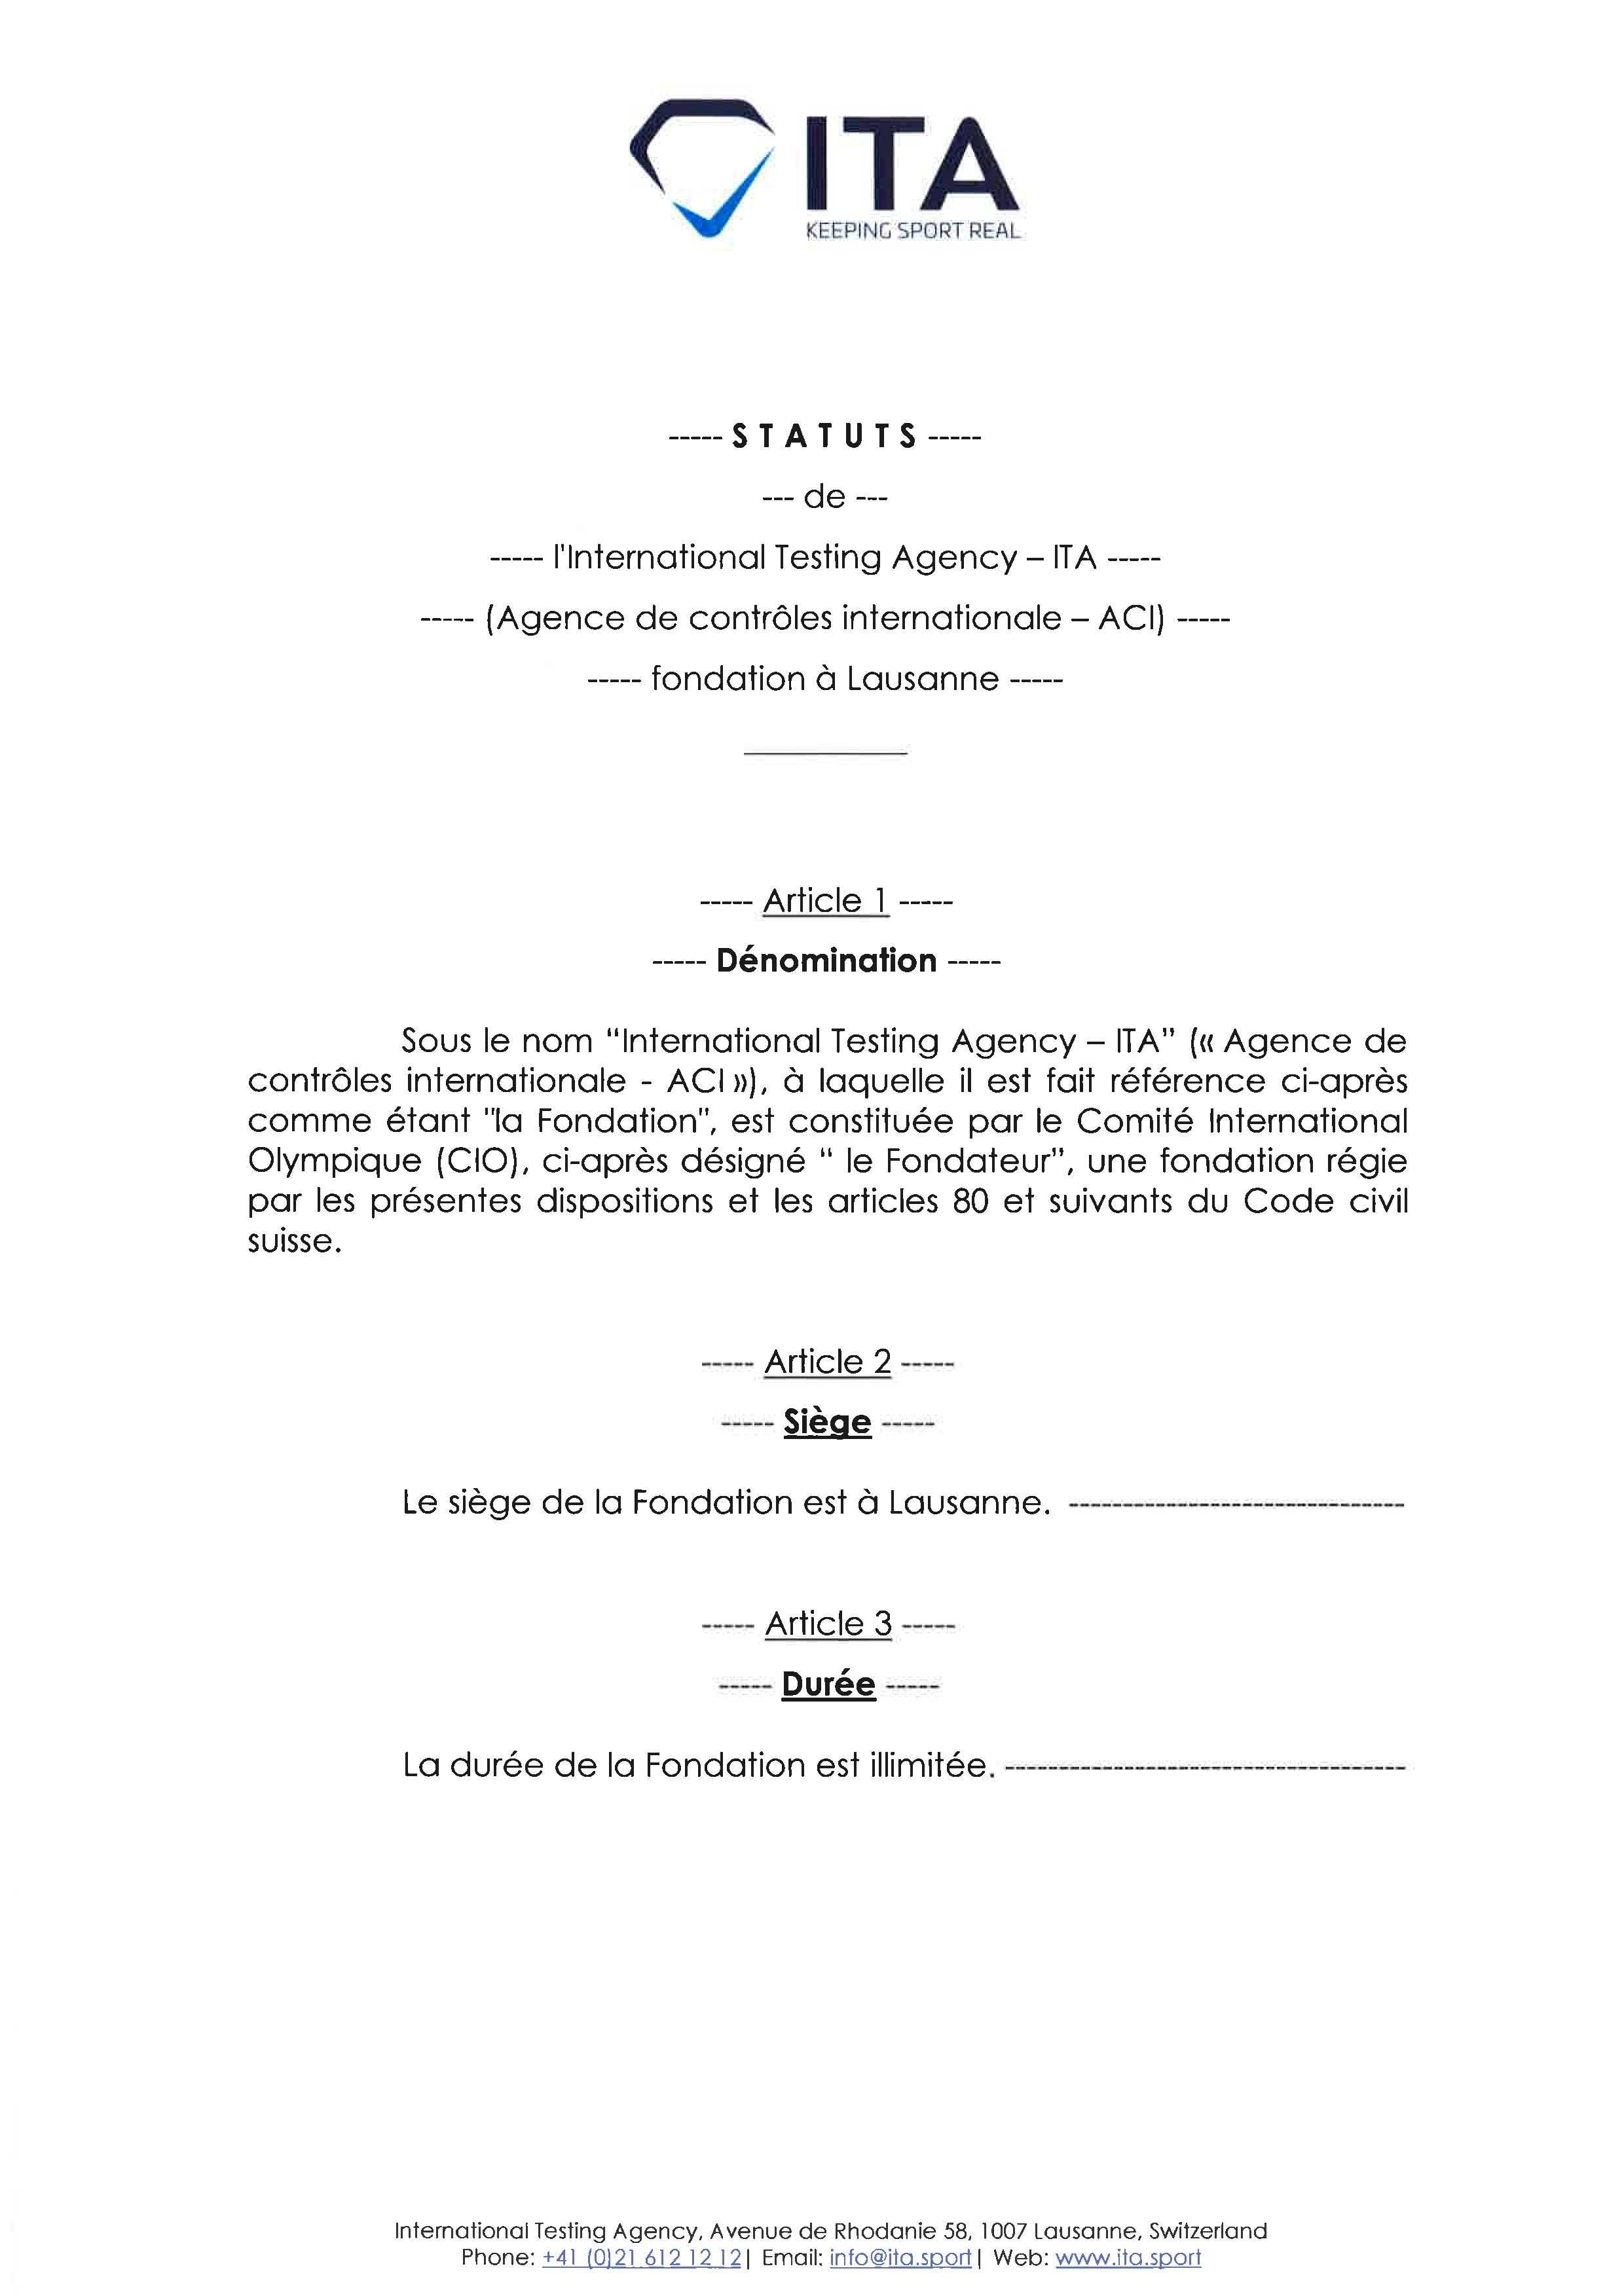 Statuts de l'ITA